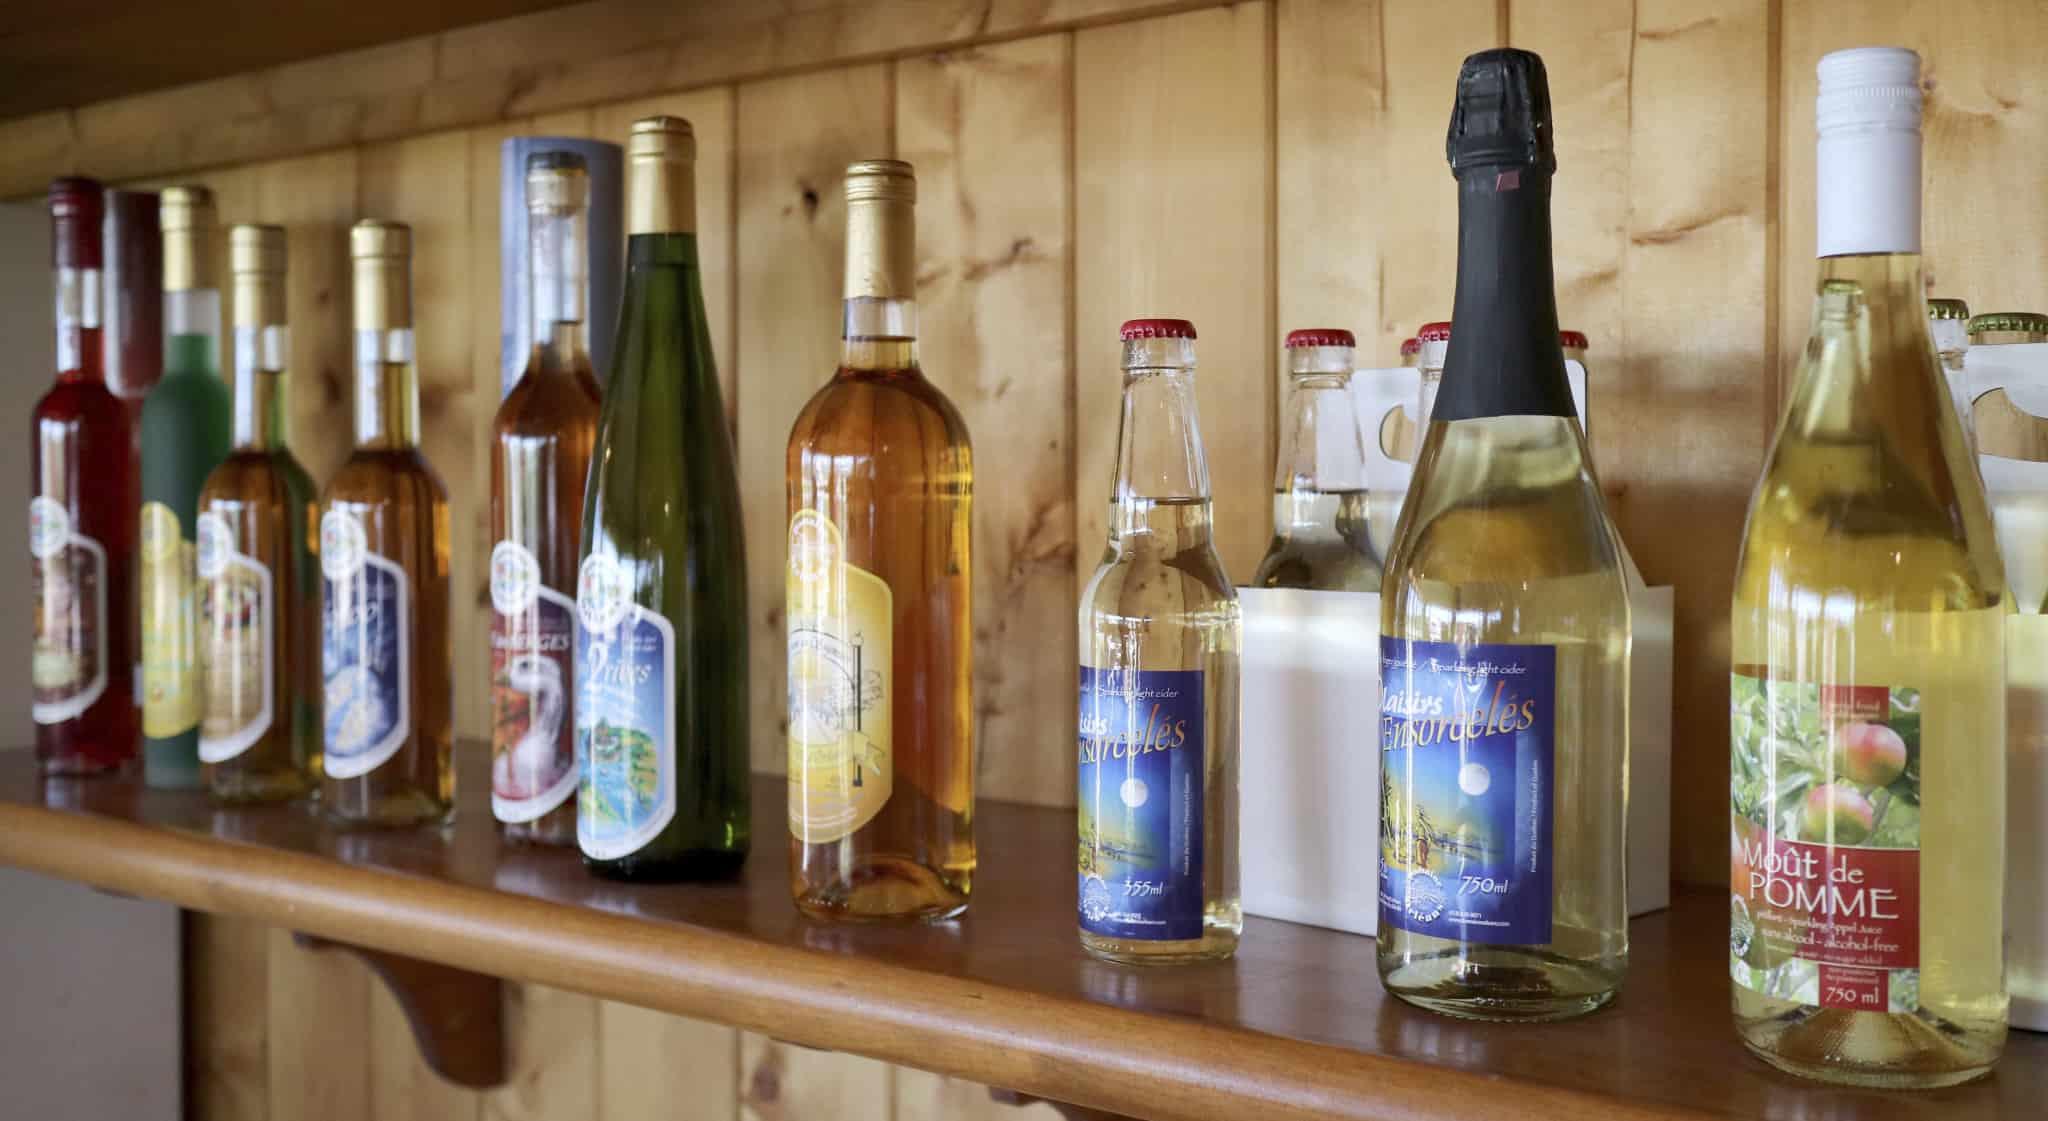 Quebec_Domaine dOrleanes bottles